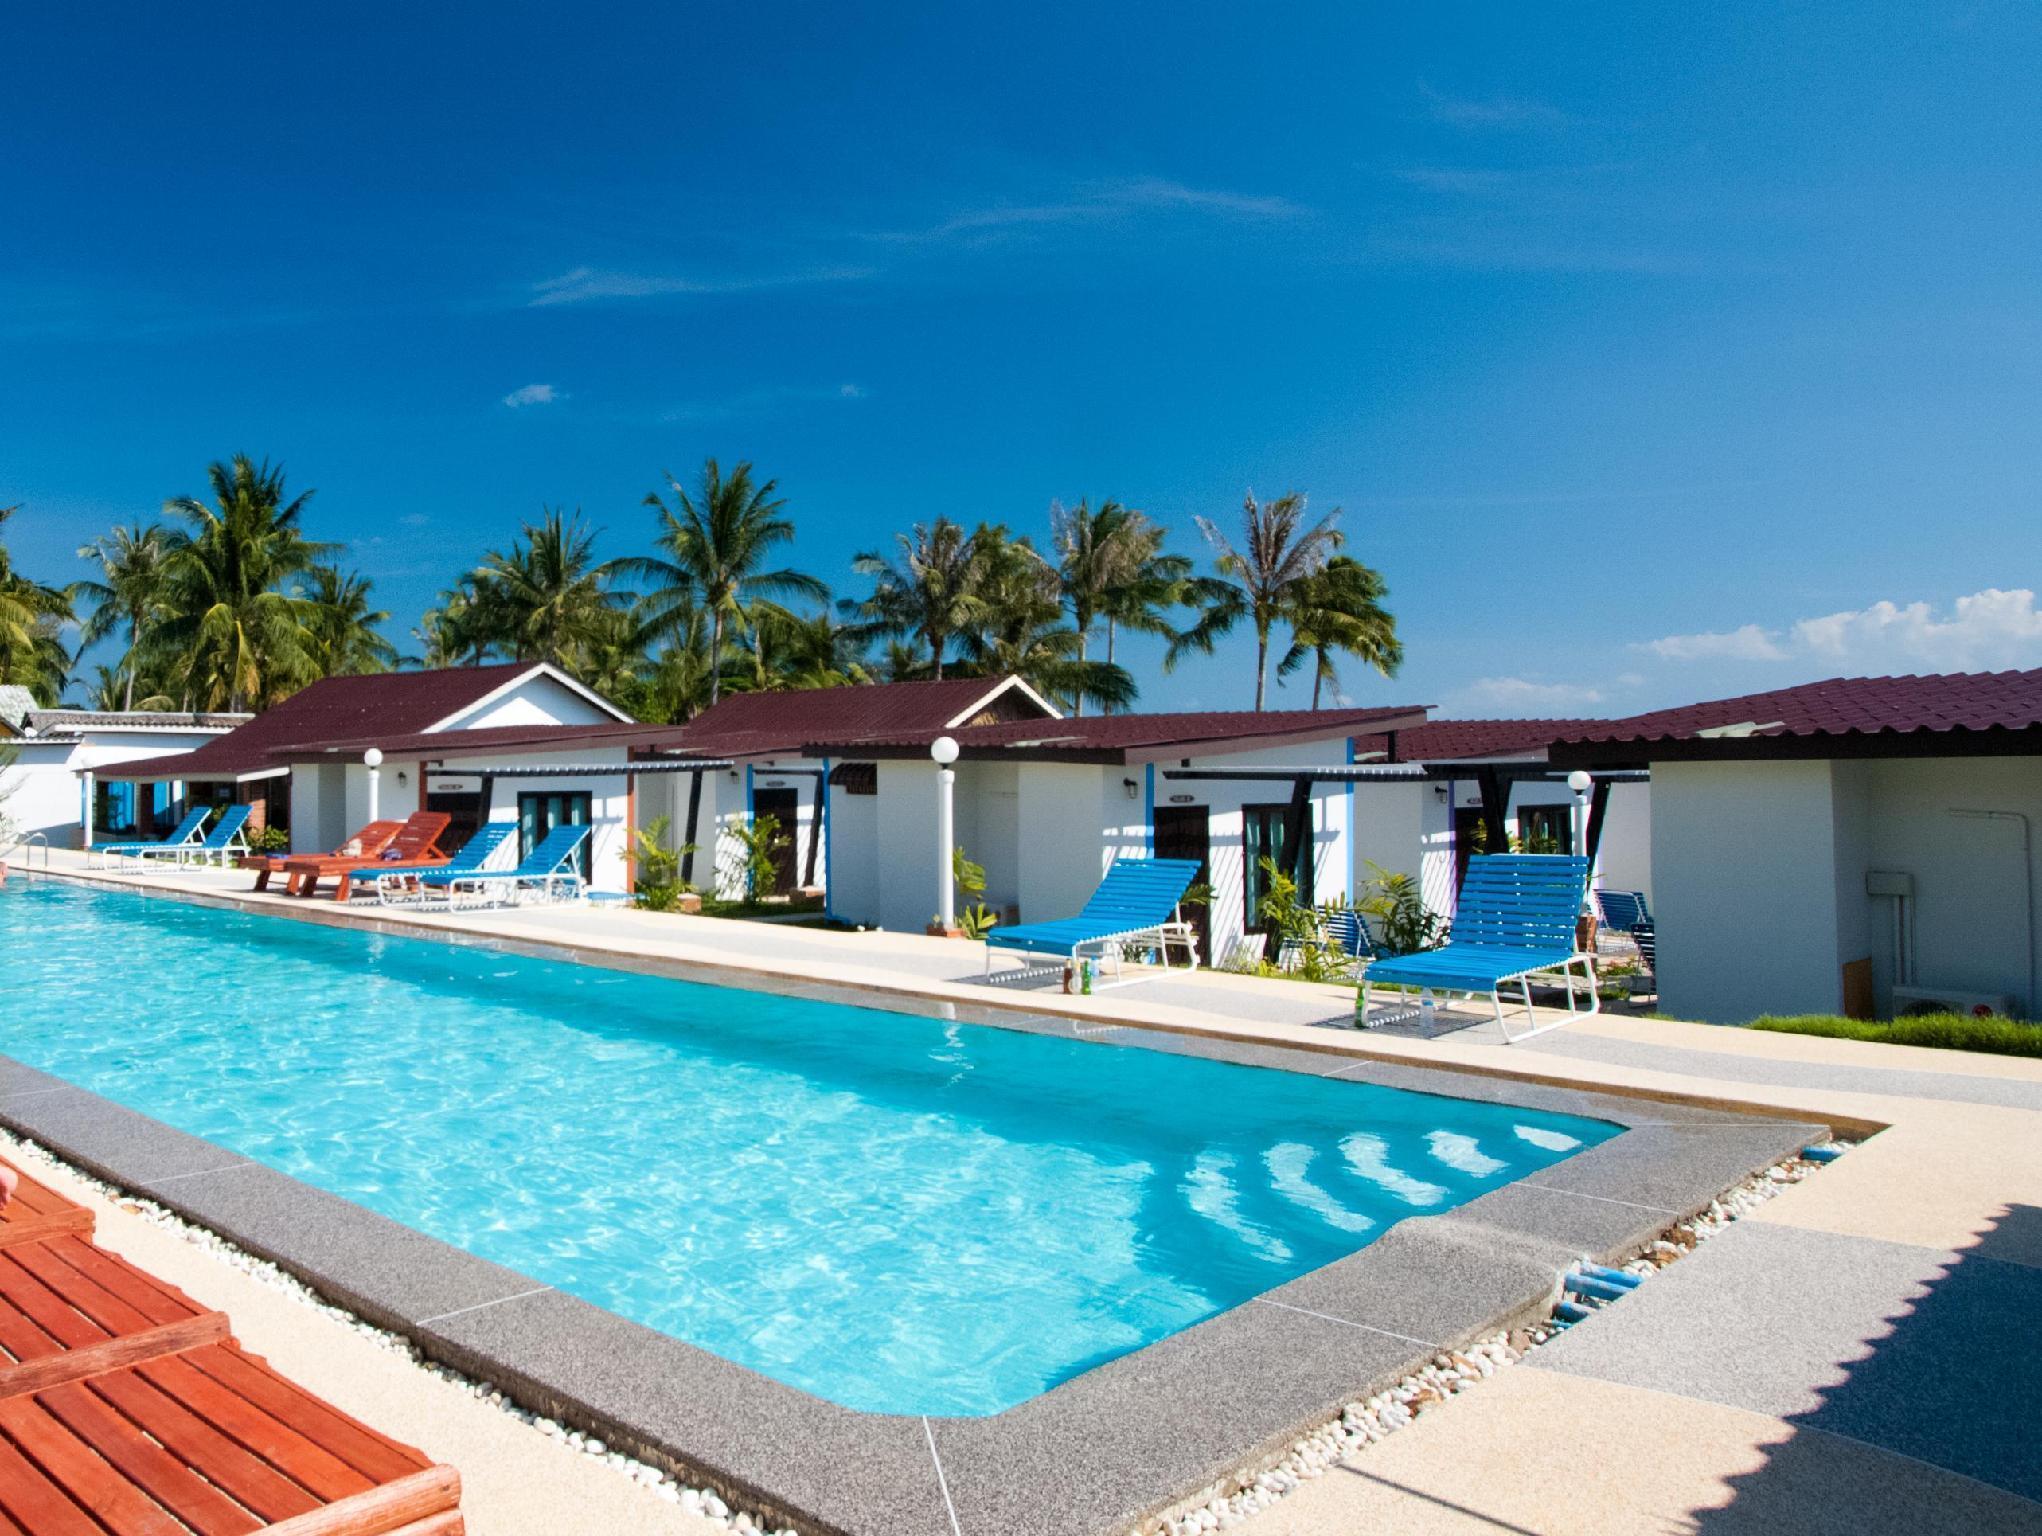 The Relax Beach Resort เดอะ รีแลกซ์ บีช รีสอร์ท